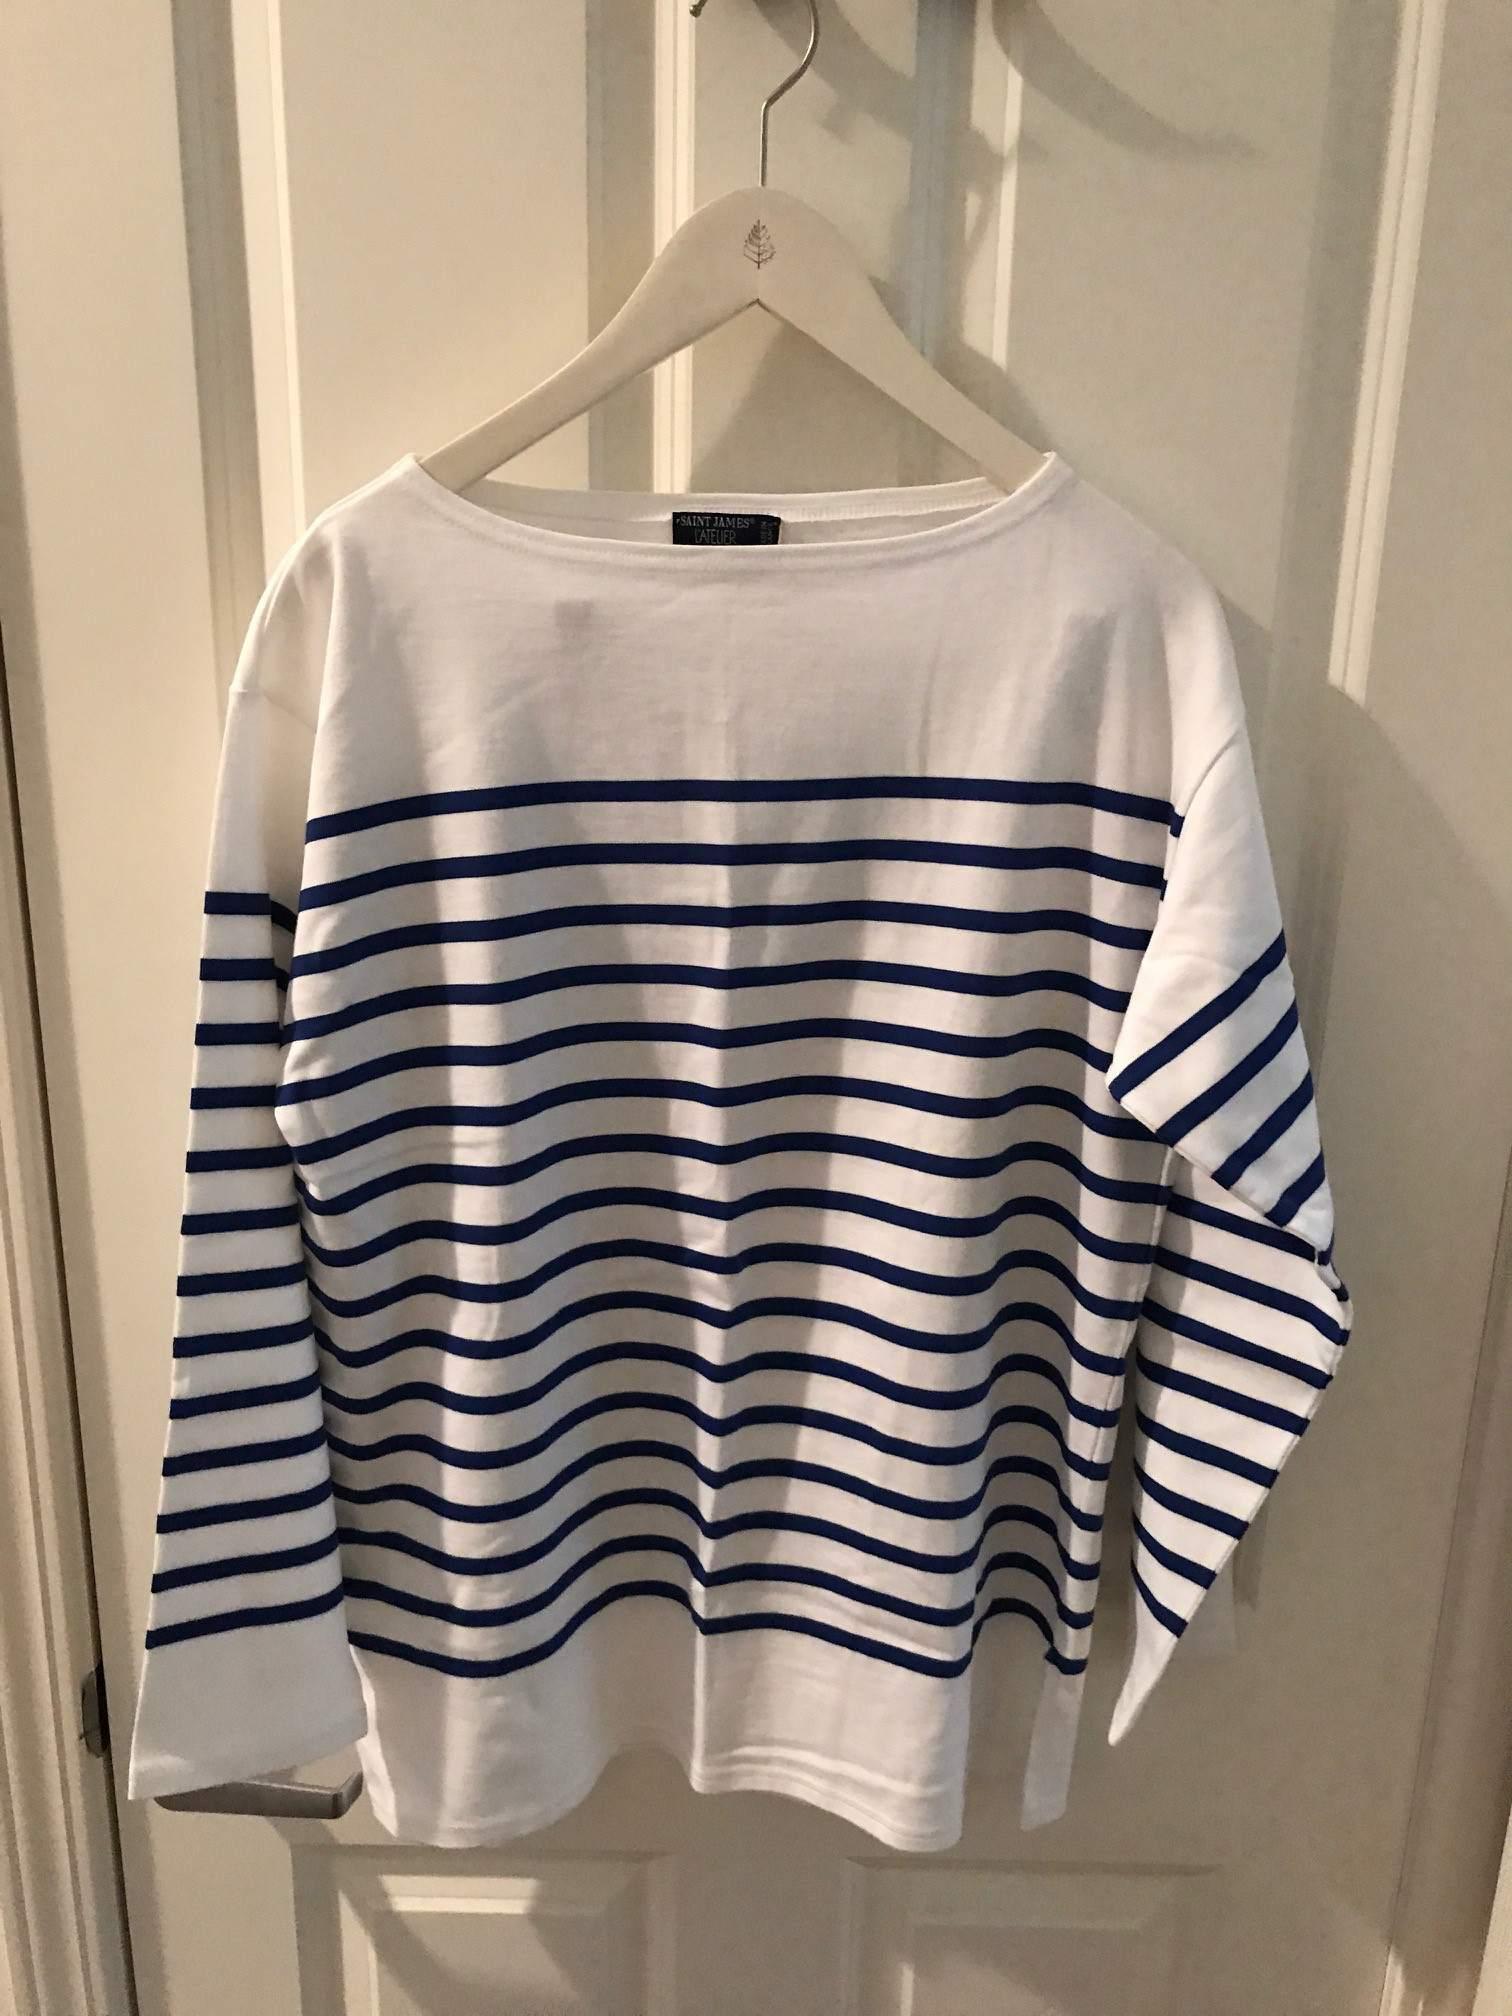 St. James L'Atelier Breton Shirt - size Large (6)